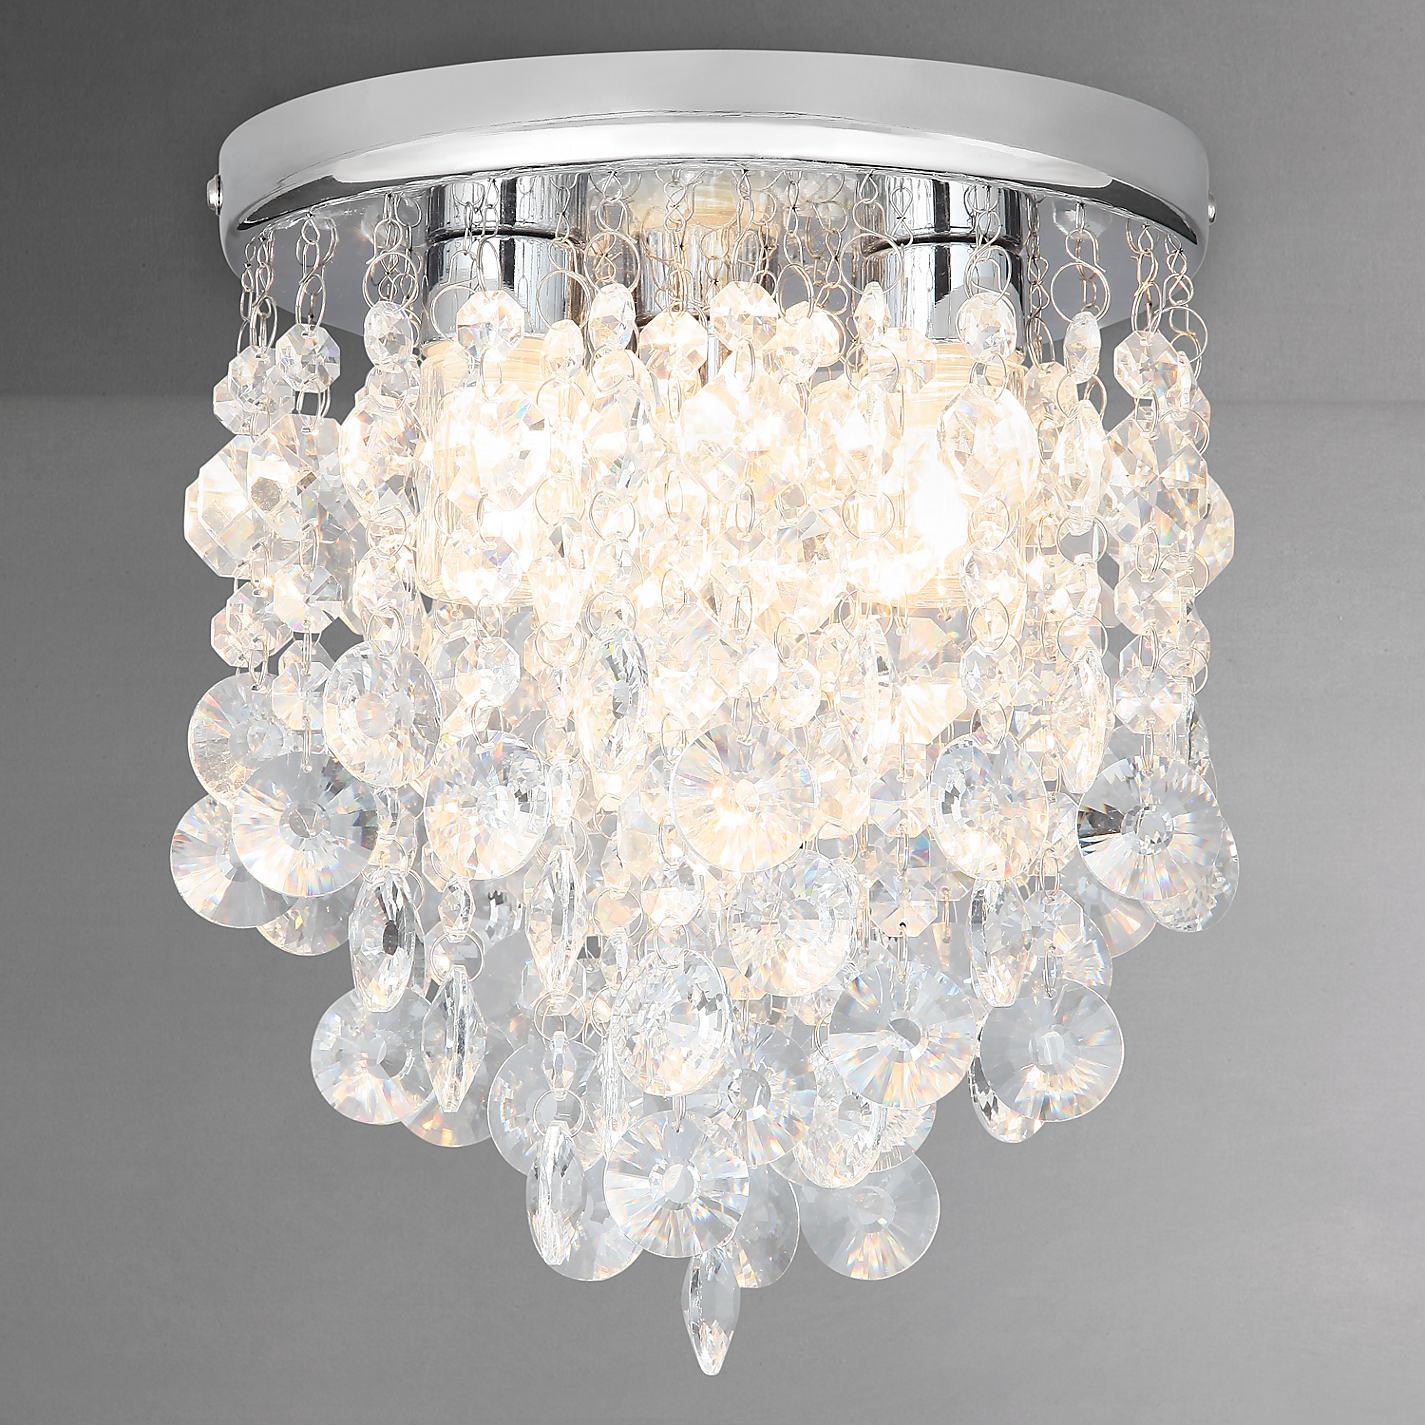 bathroom ceiling lights, Home decor